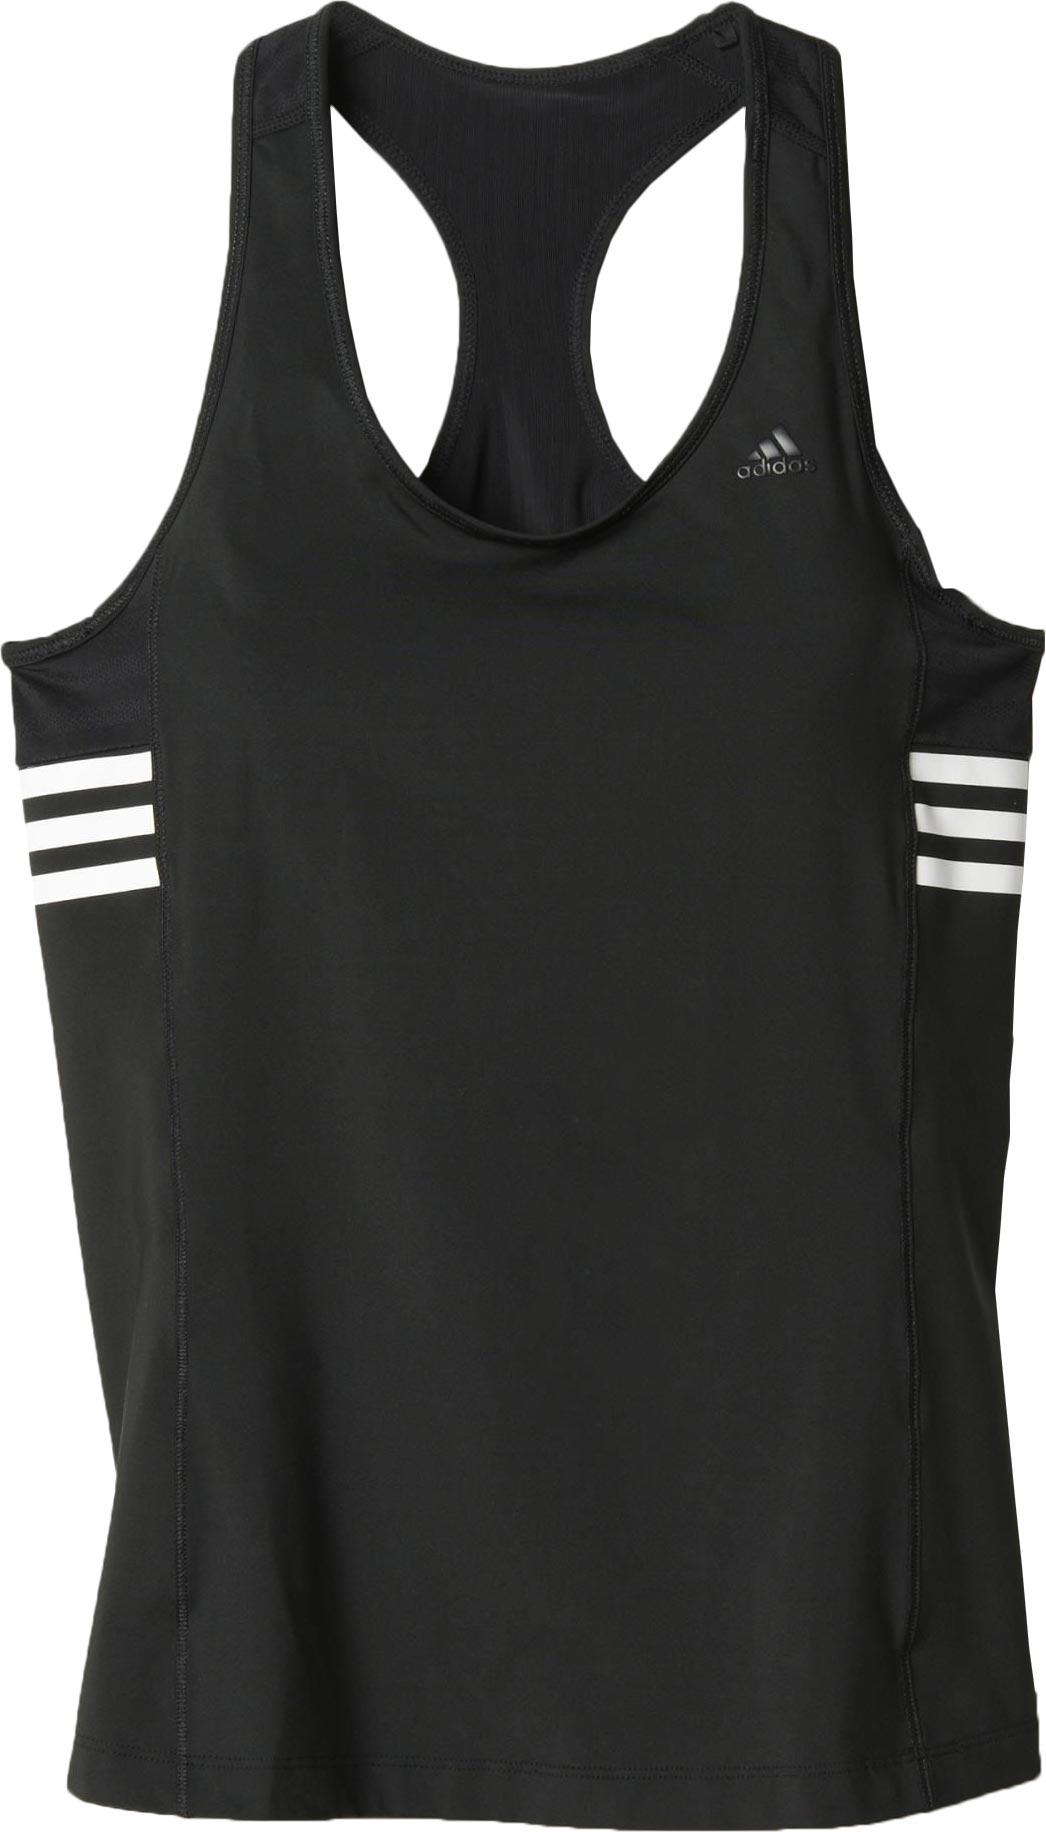 adidas gym bra